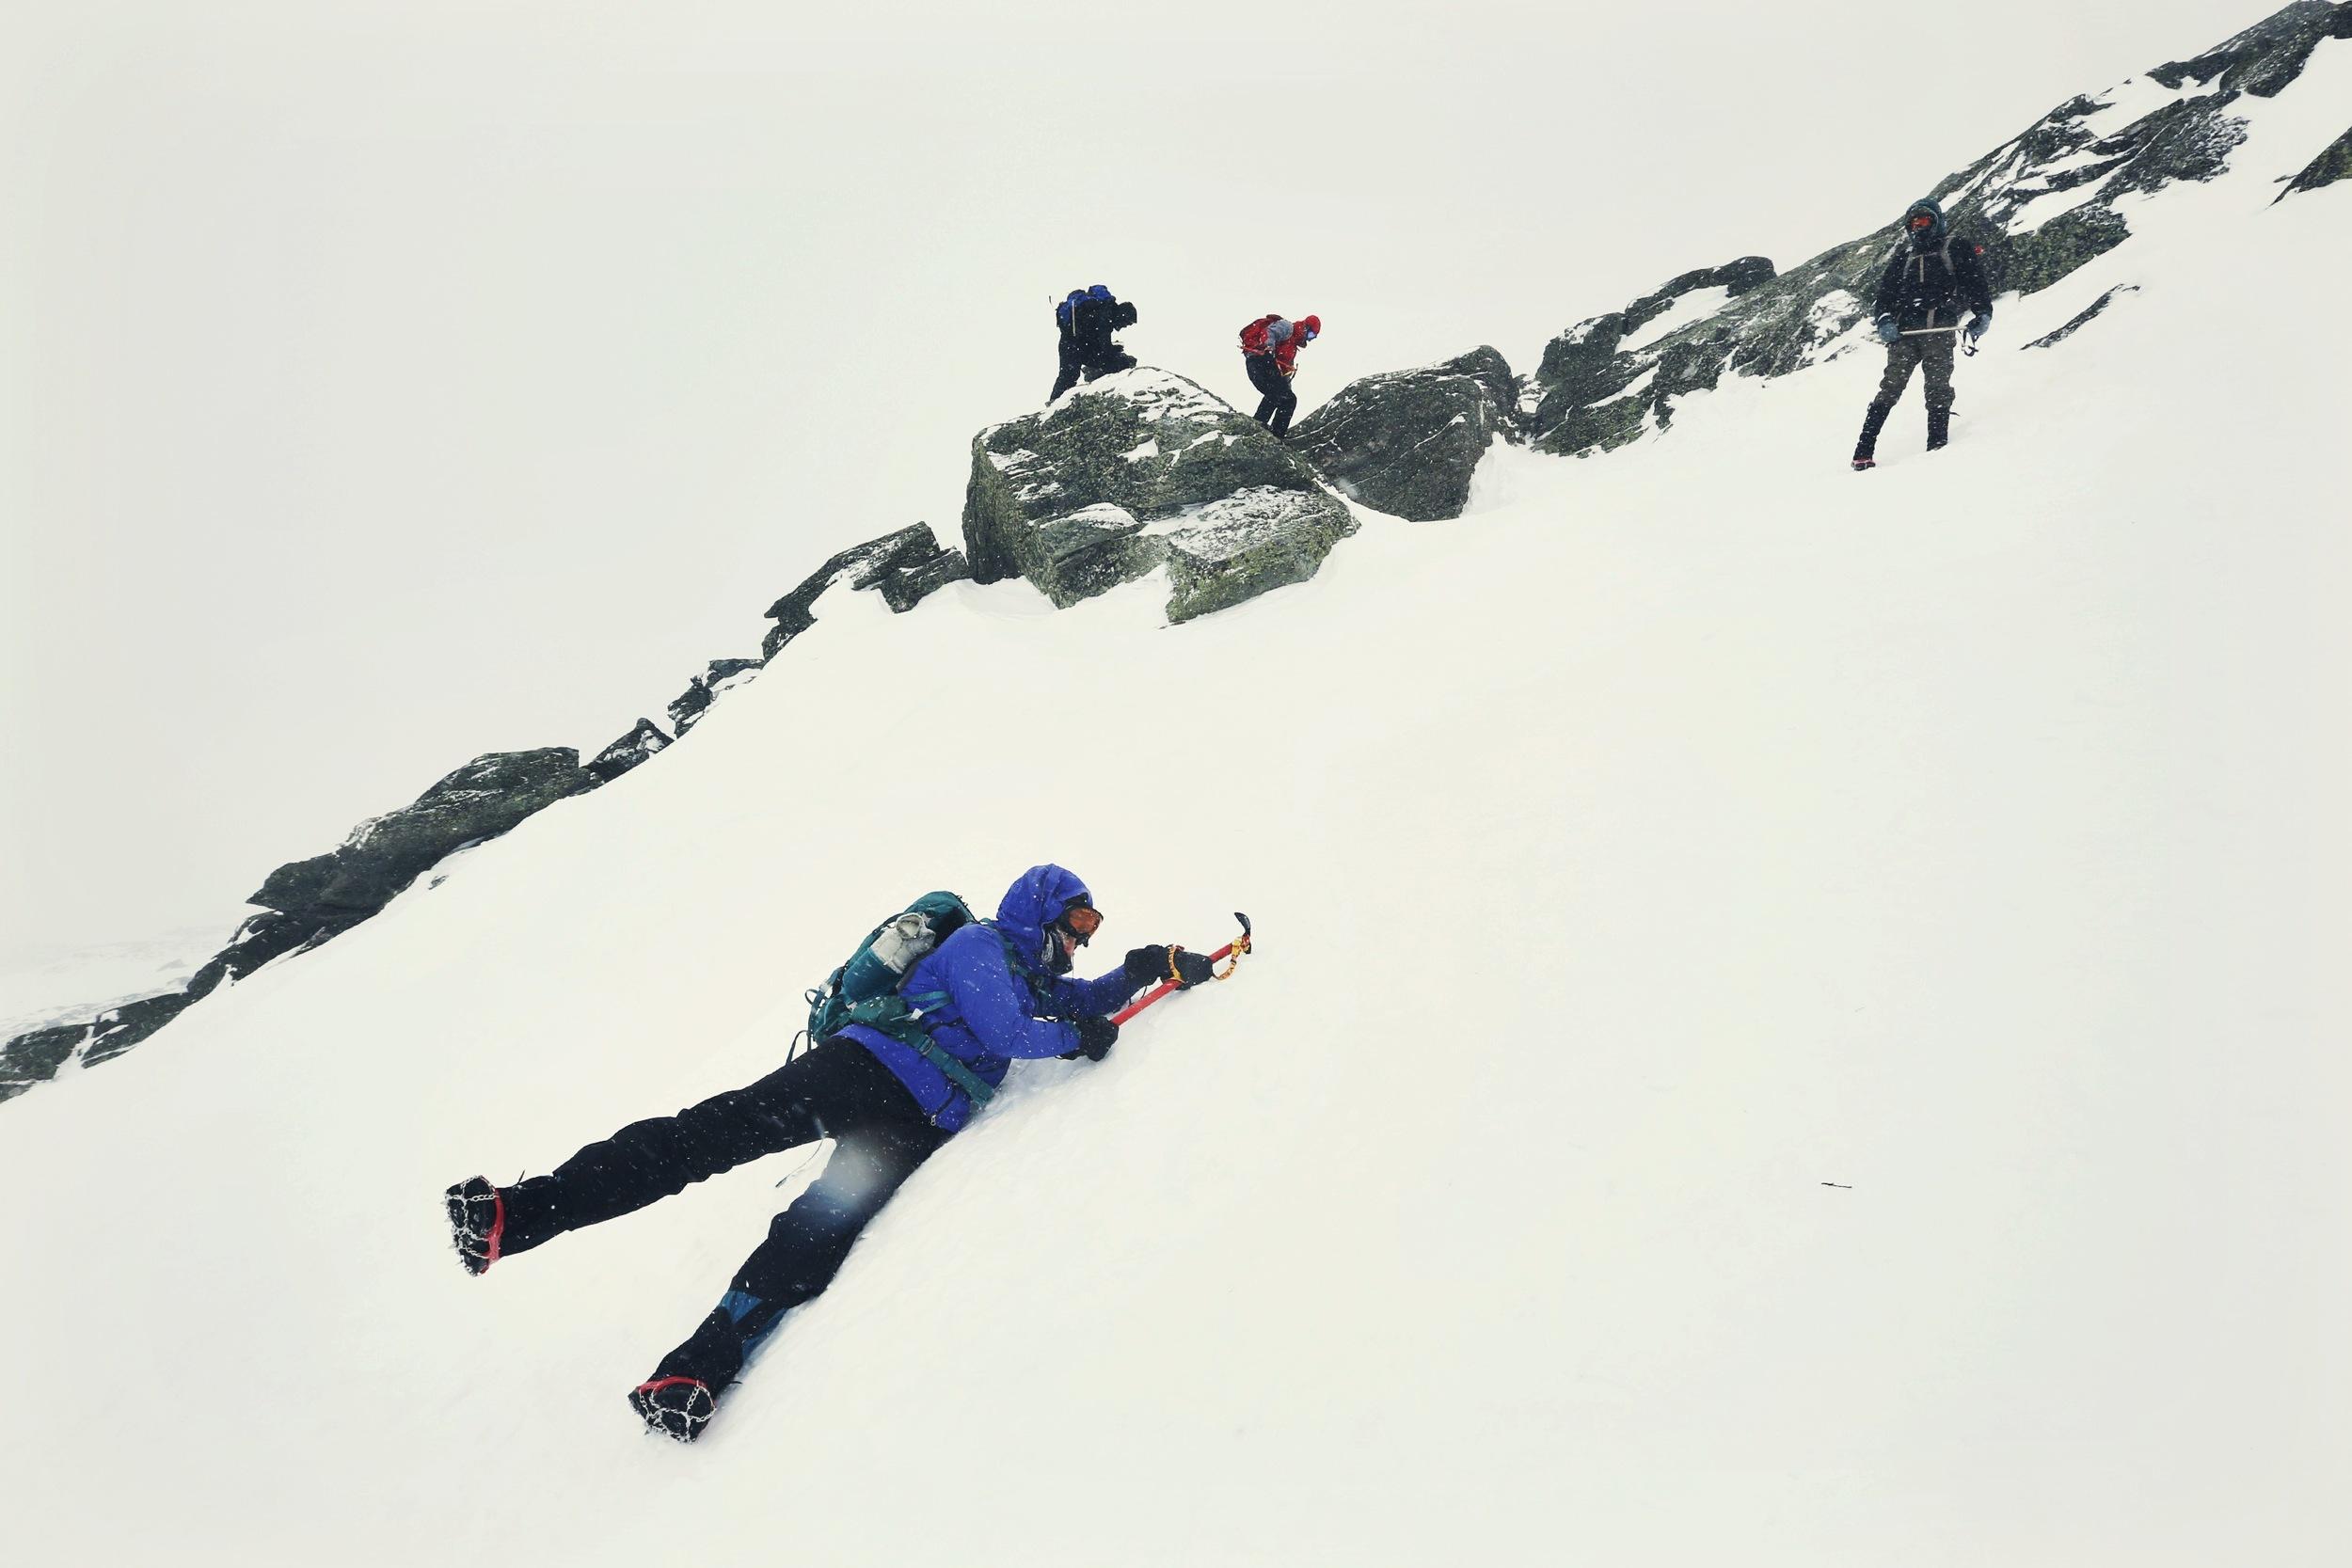 Self-arresting down the mountainside ©Robert Bukaty